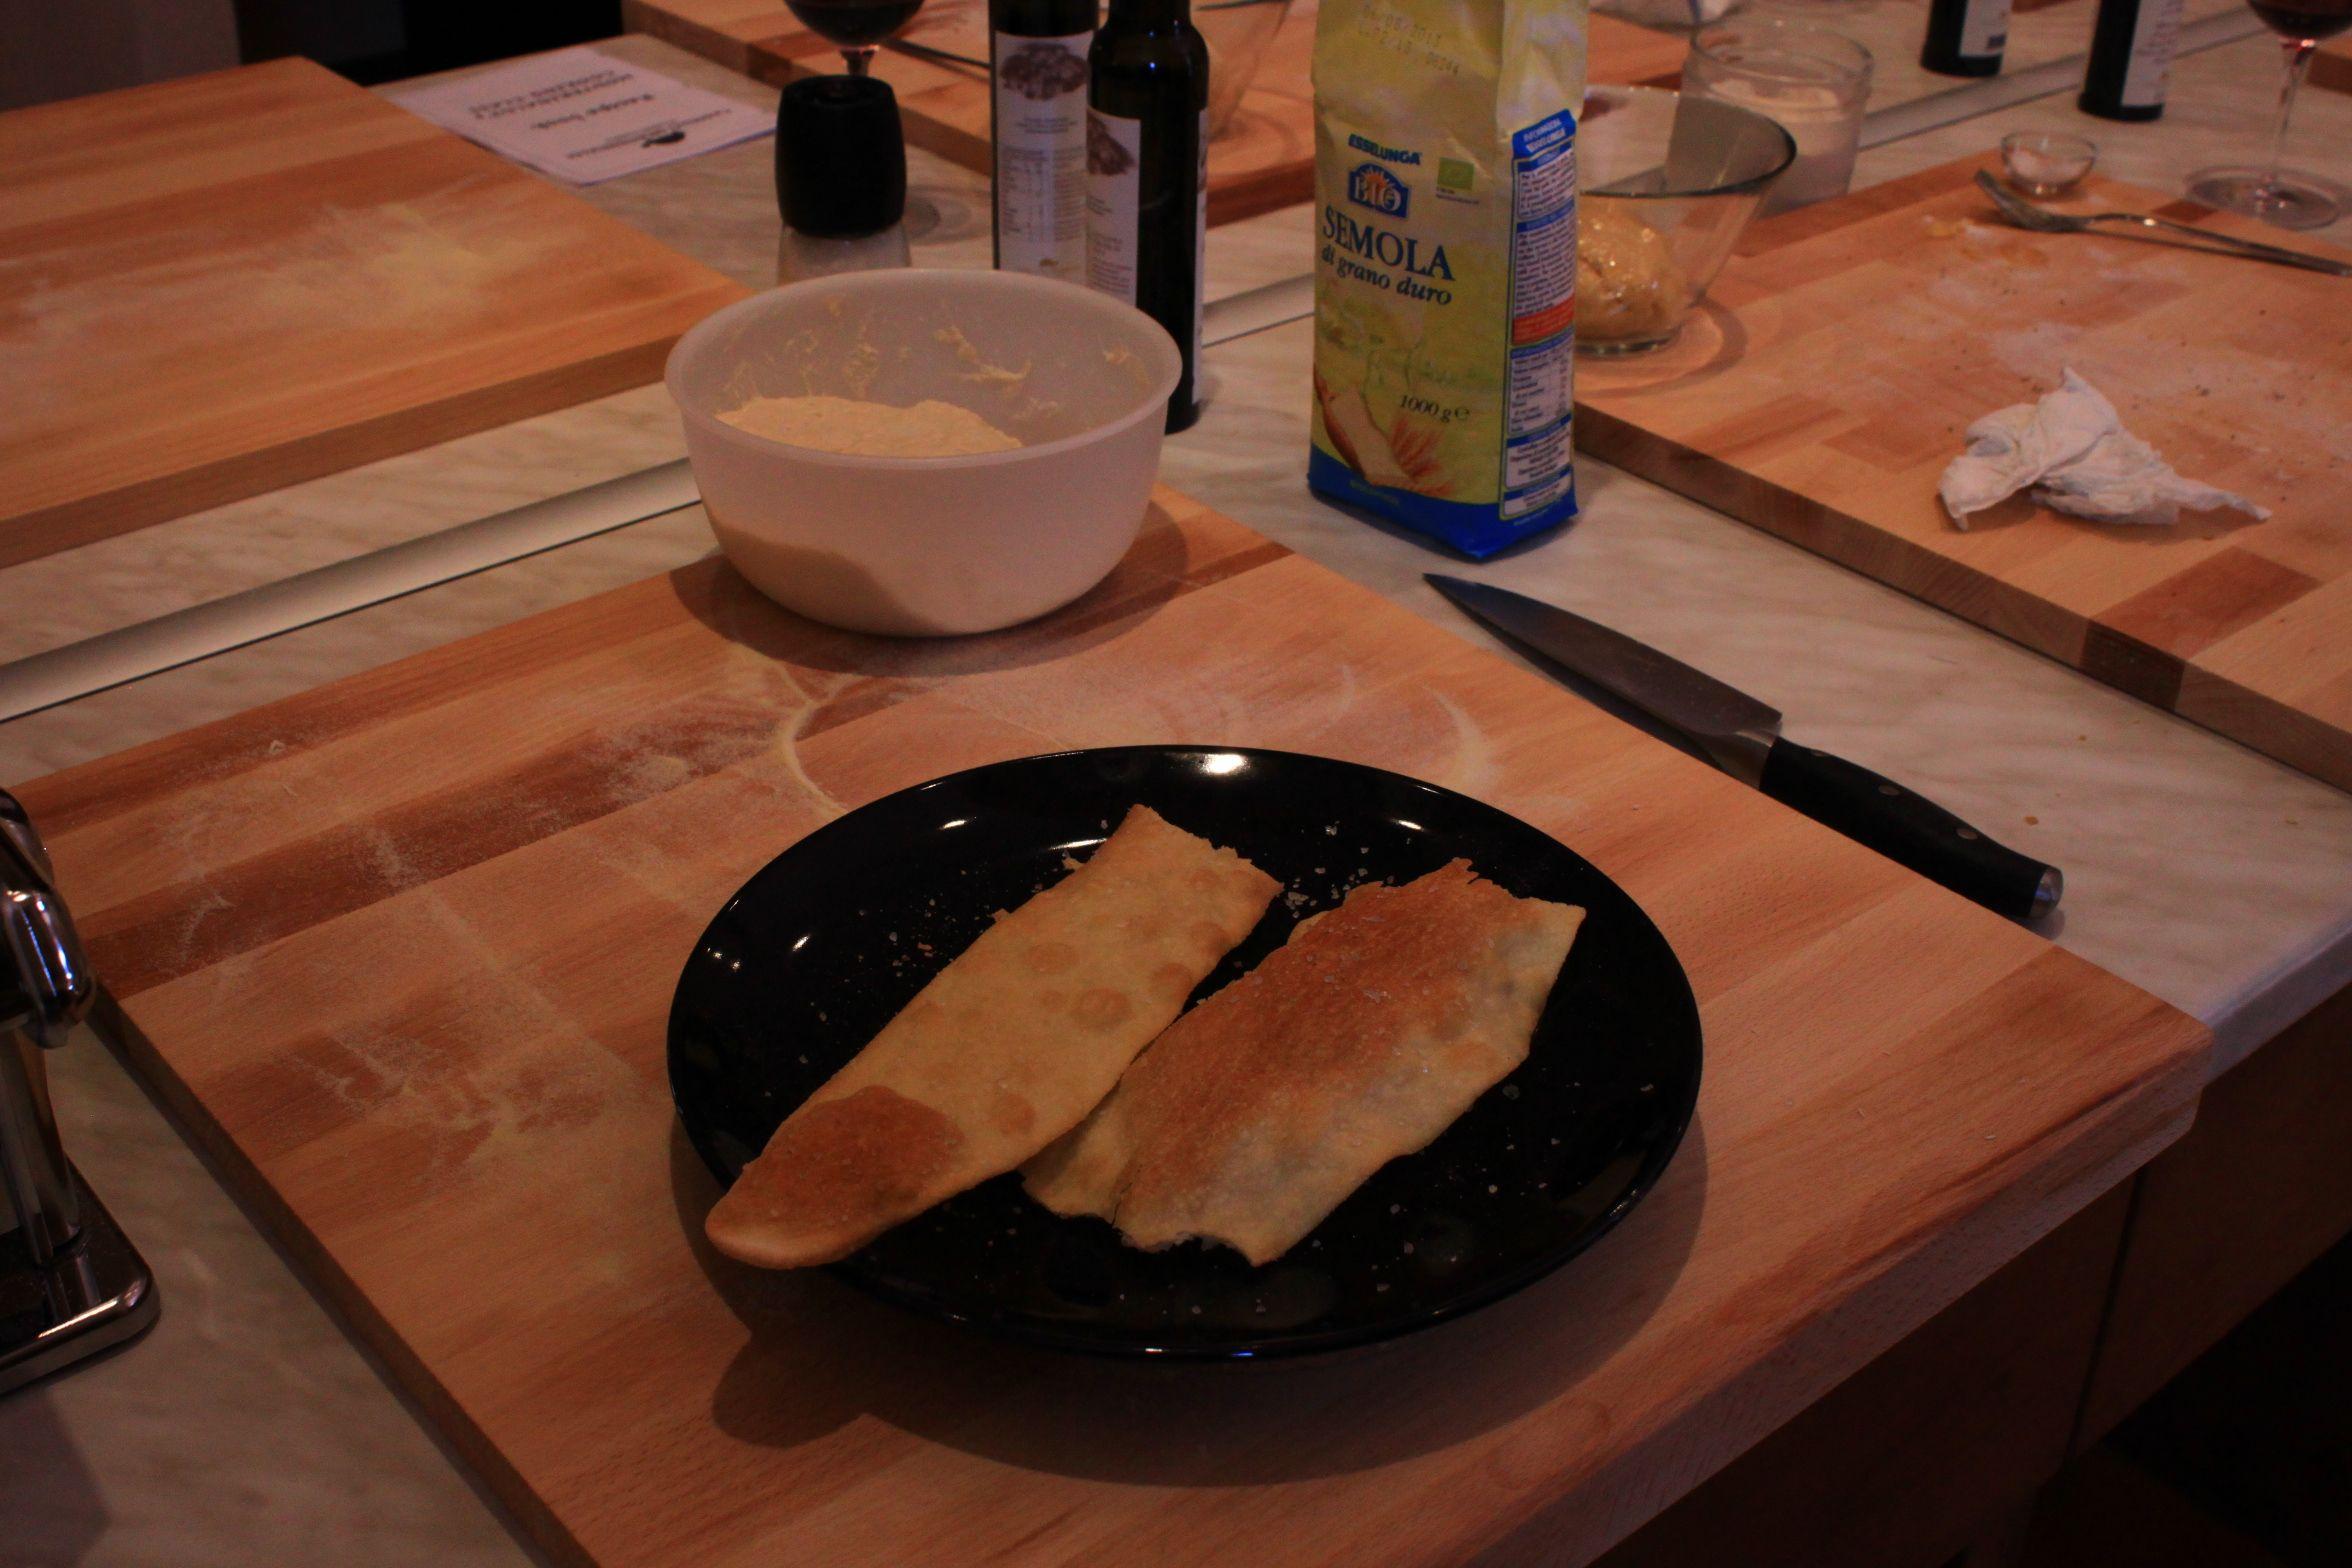 Your schiacciata is ready now!